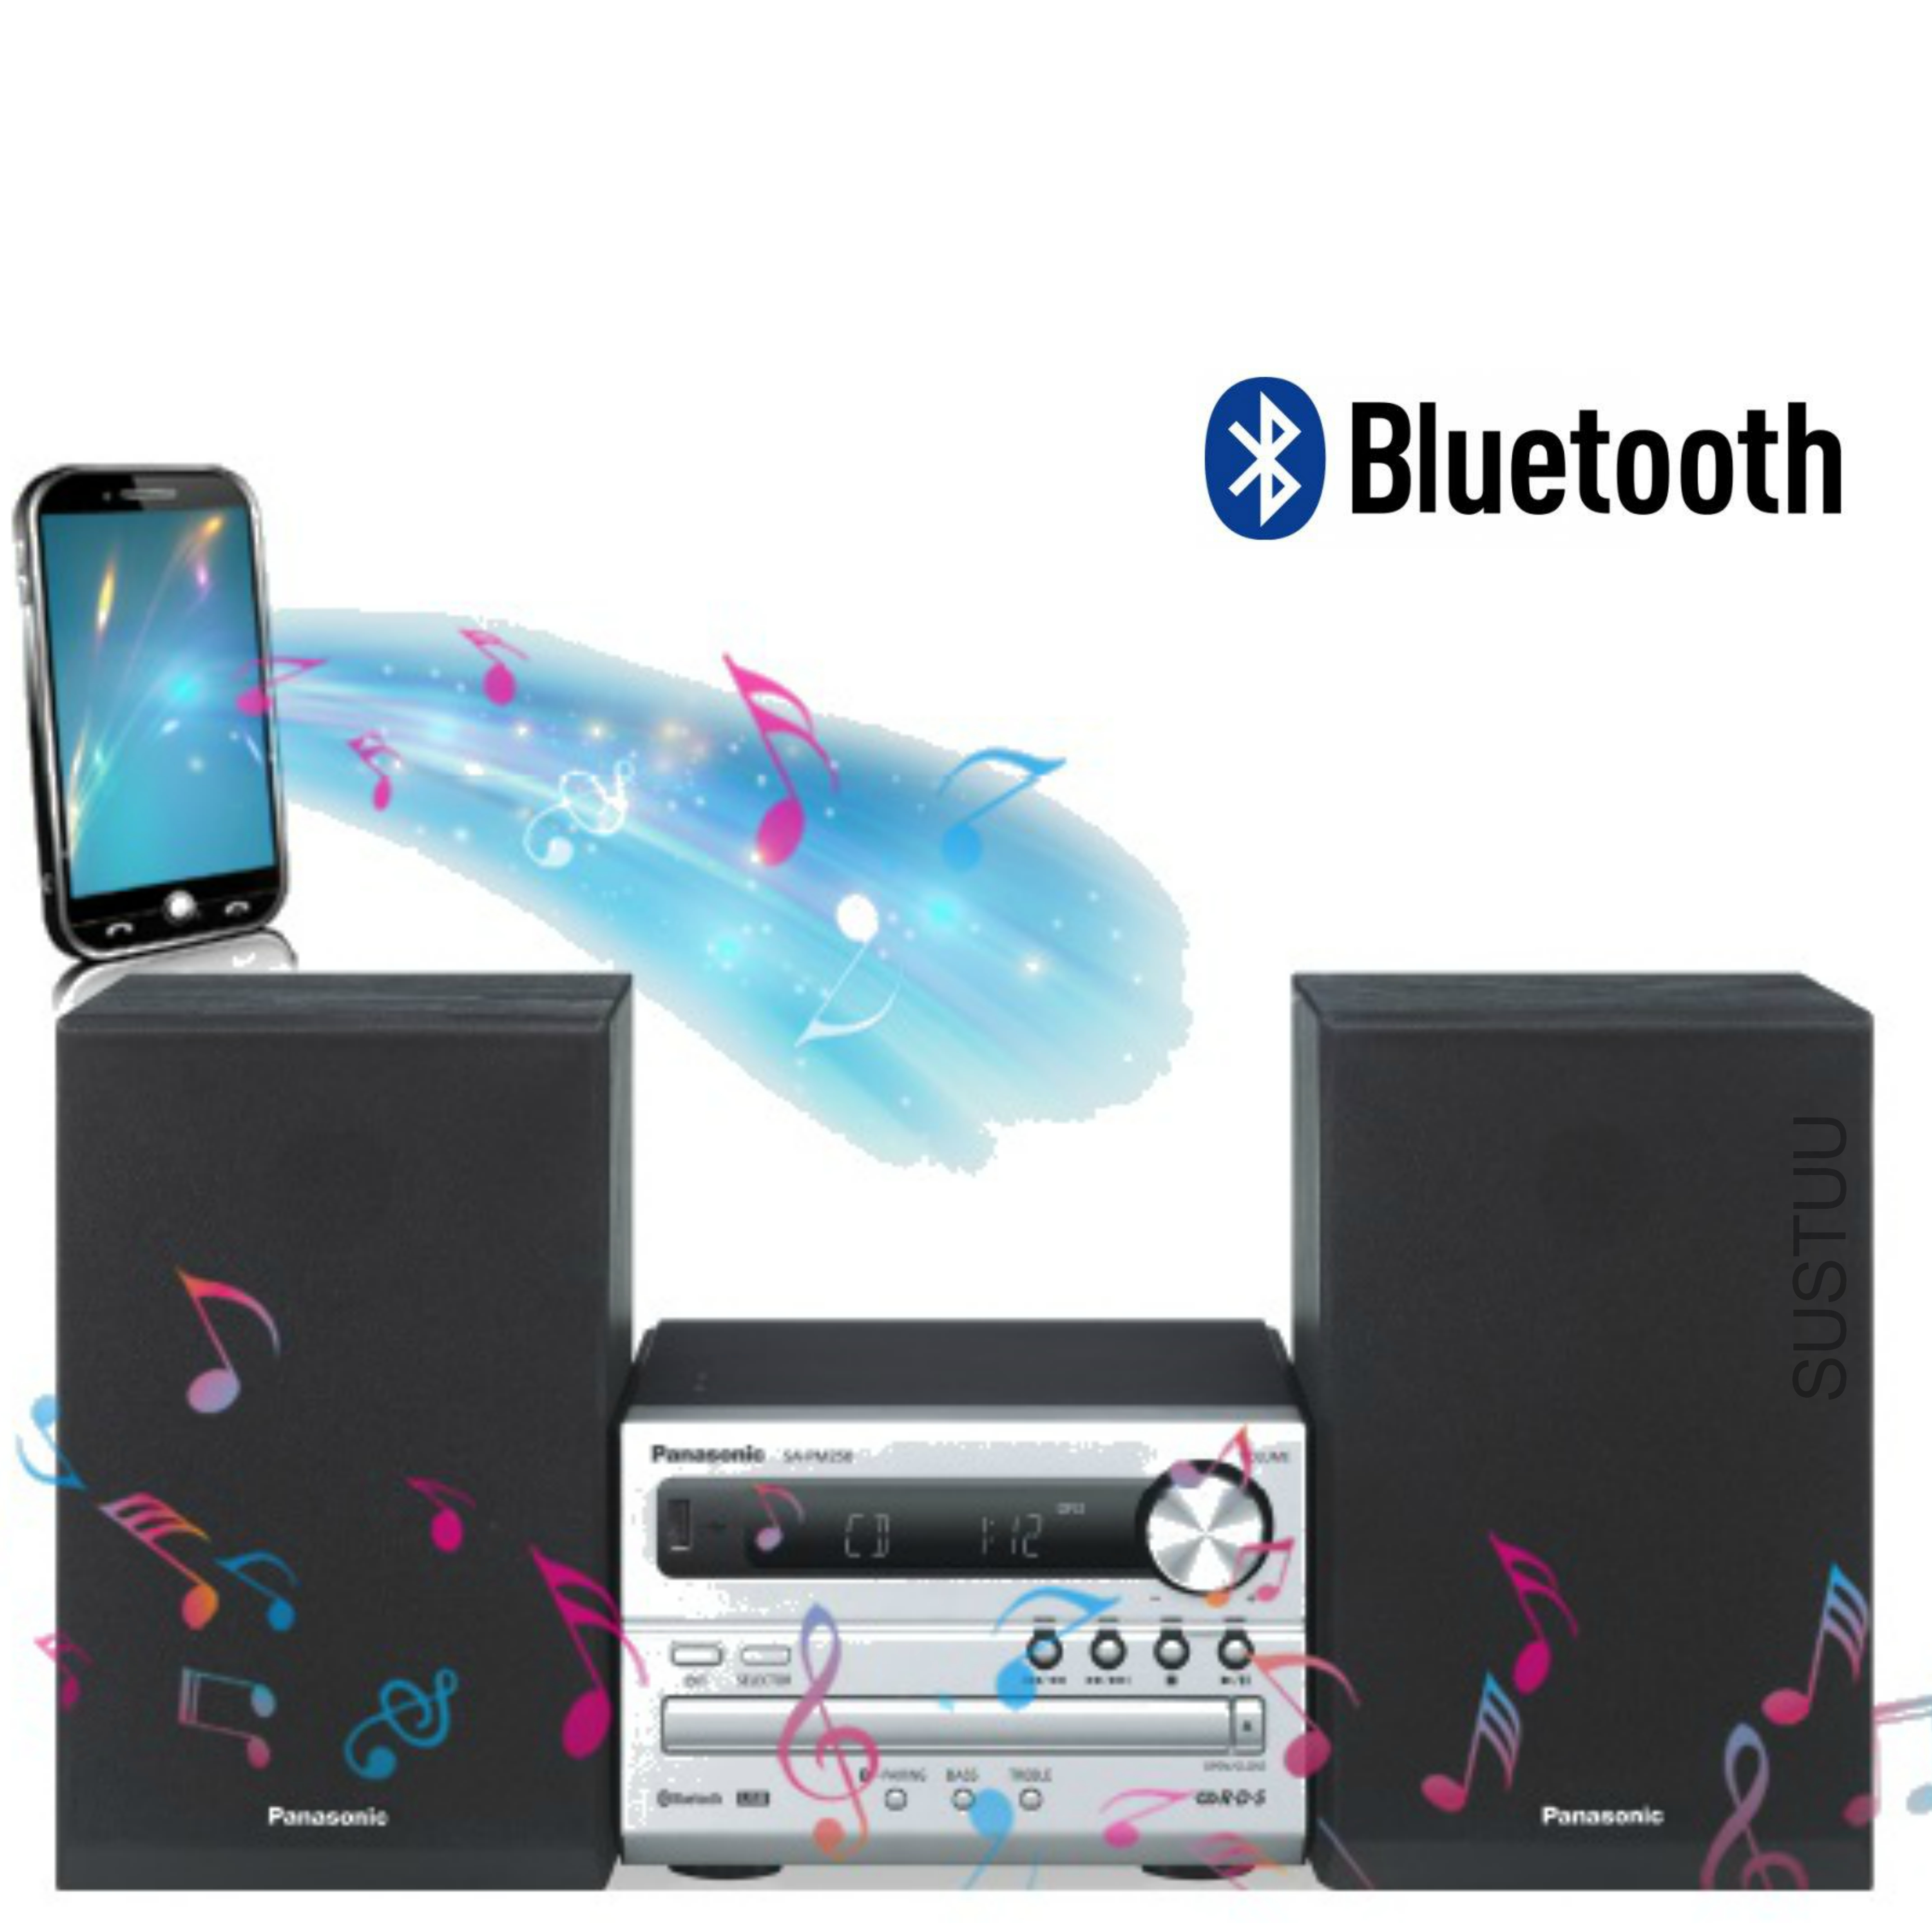 Panasonic New SCPM250EBS Bluetooth Micro Hi-FI Wireless Home Music System-Silver